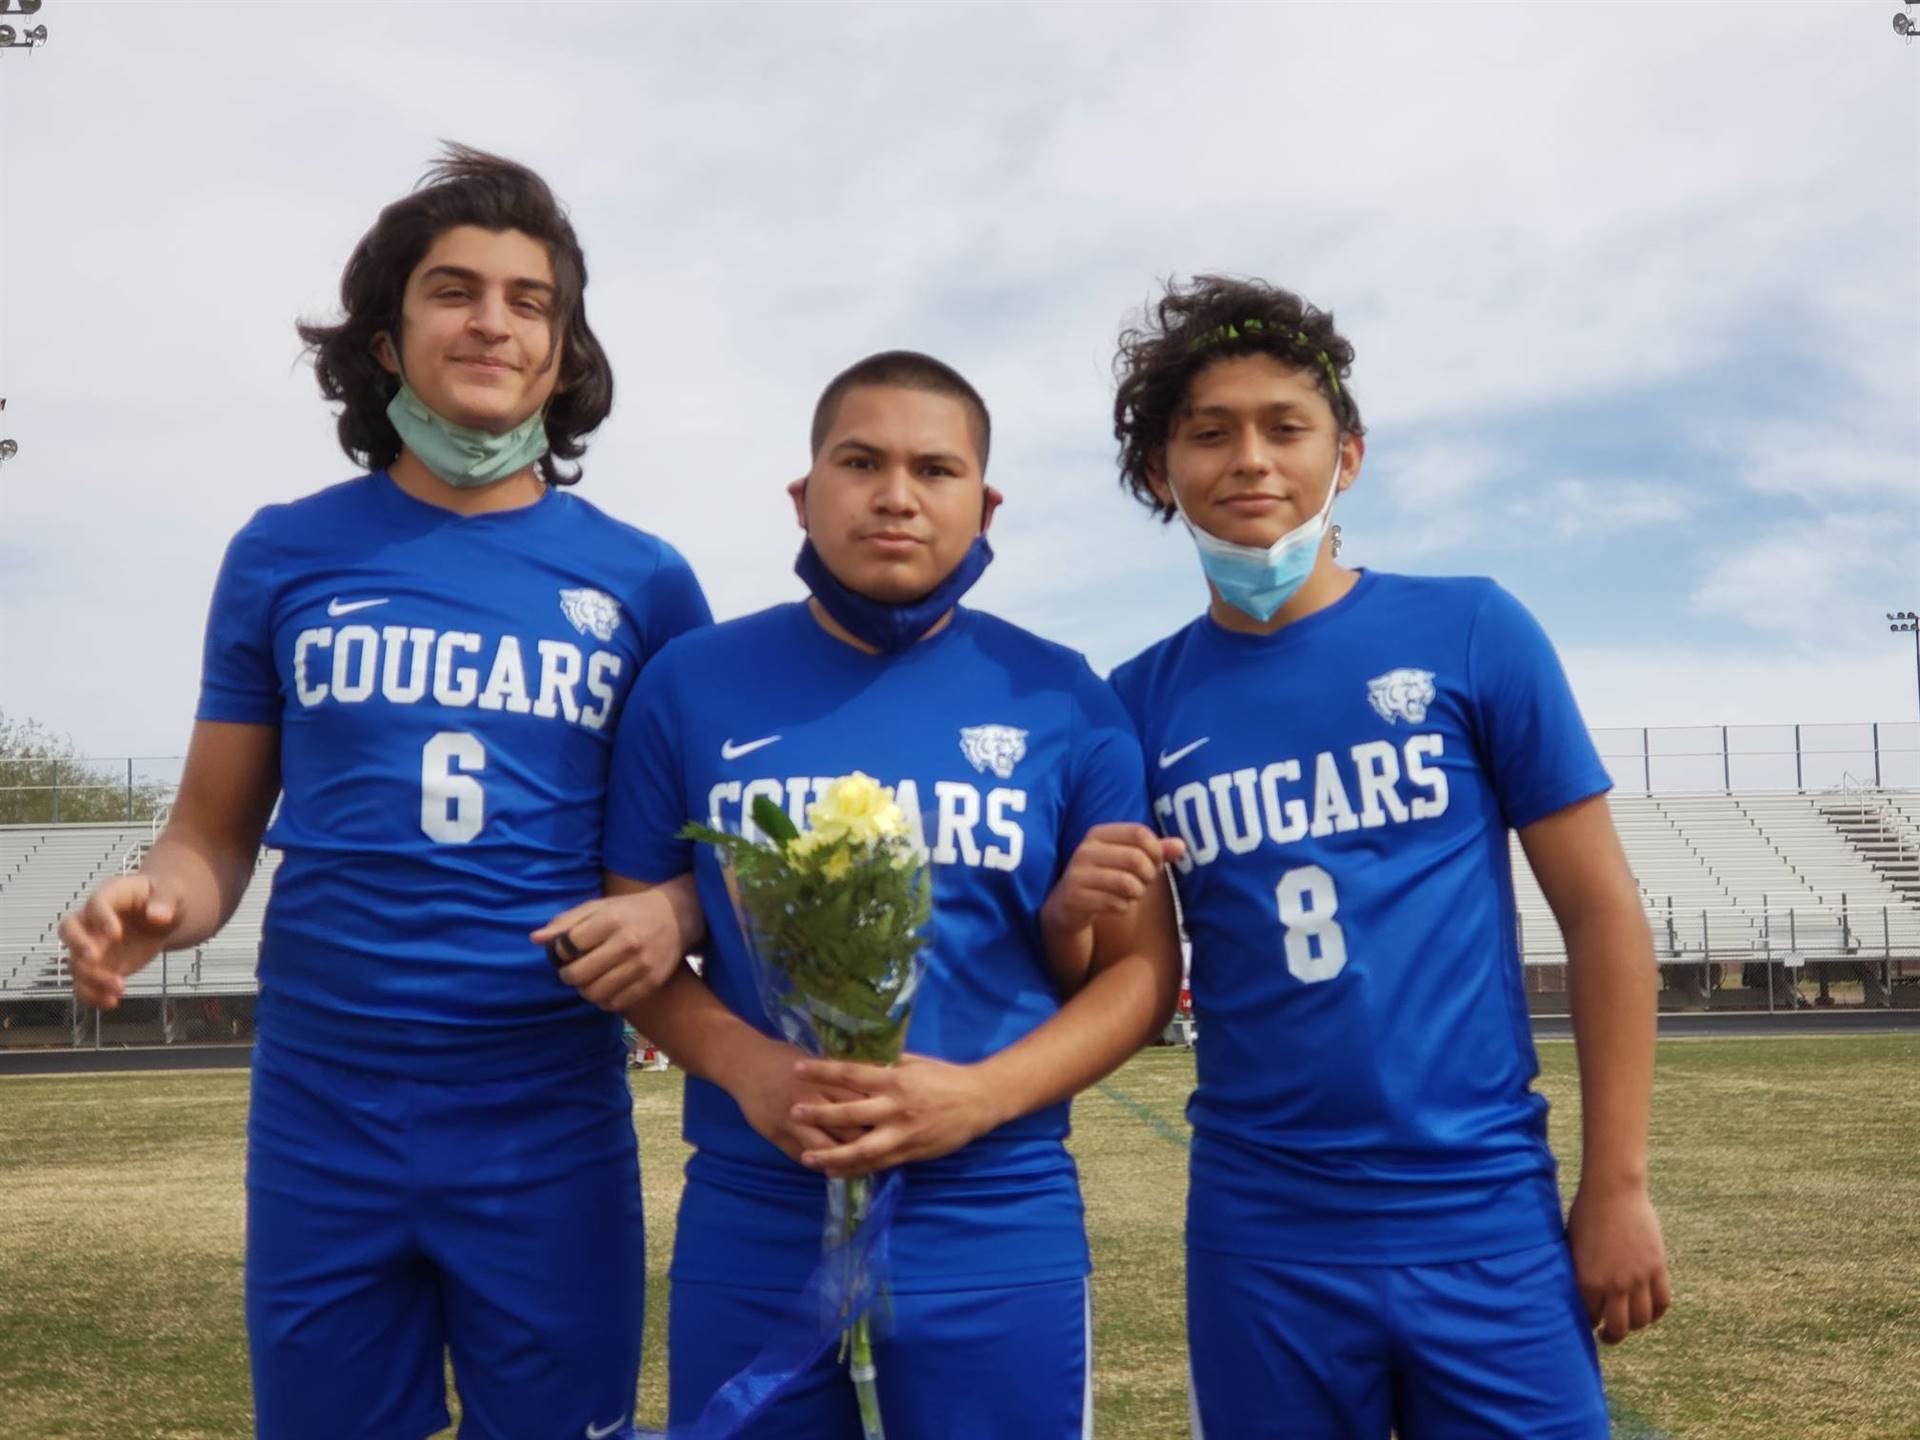 CG-SoccerBoysSeniorNight20210213 (2)